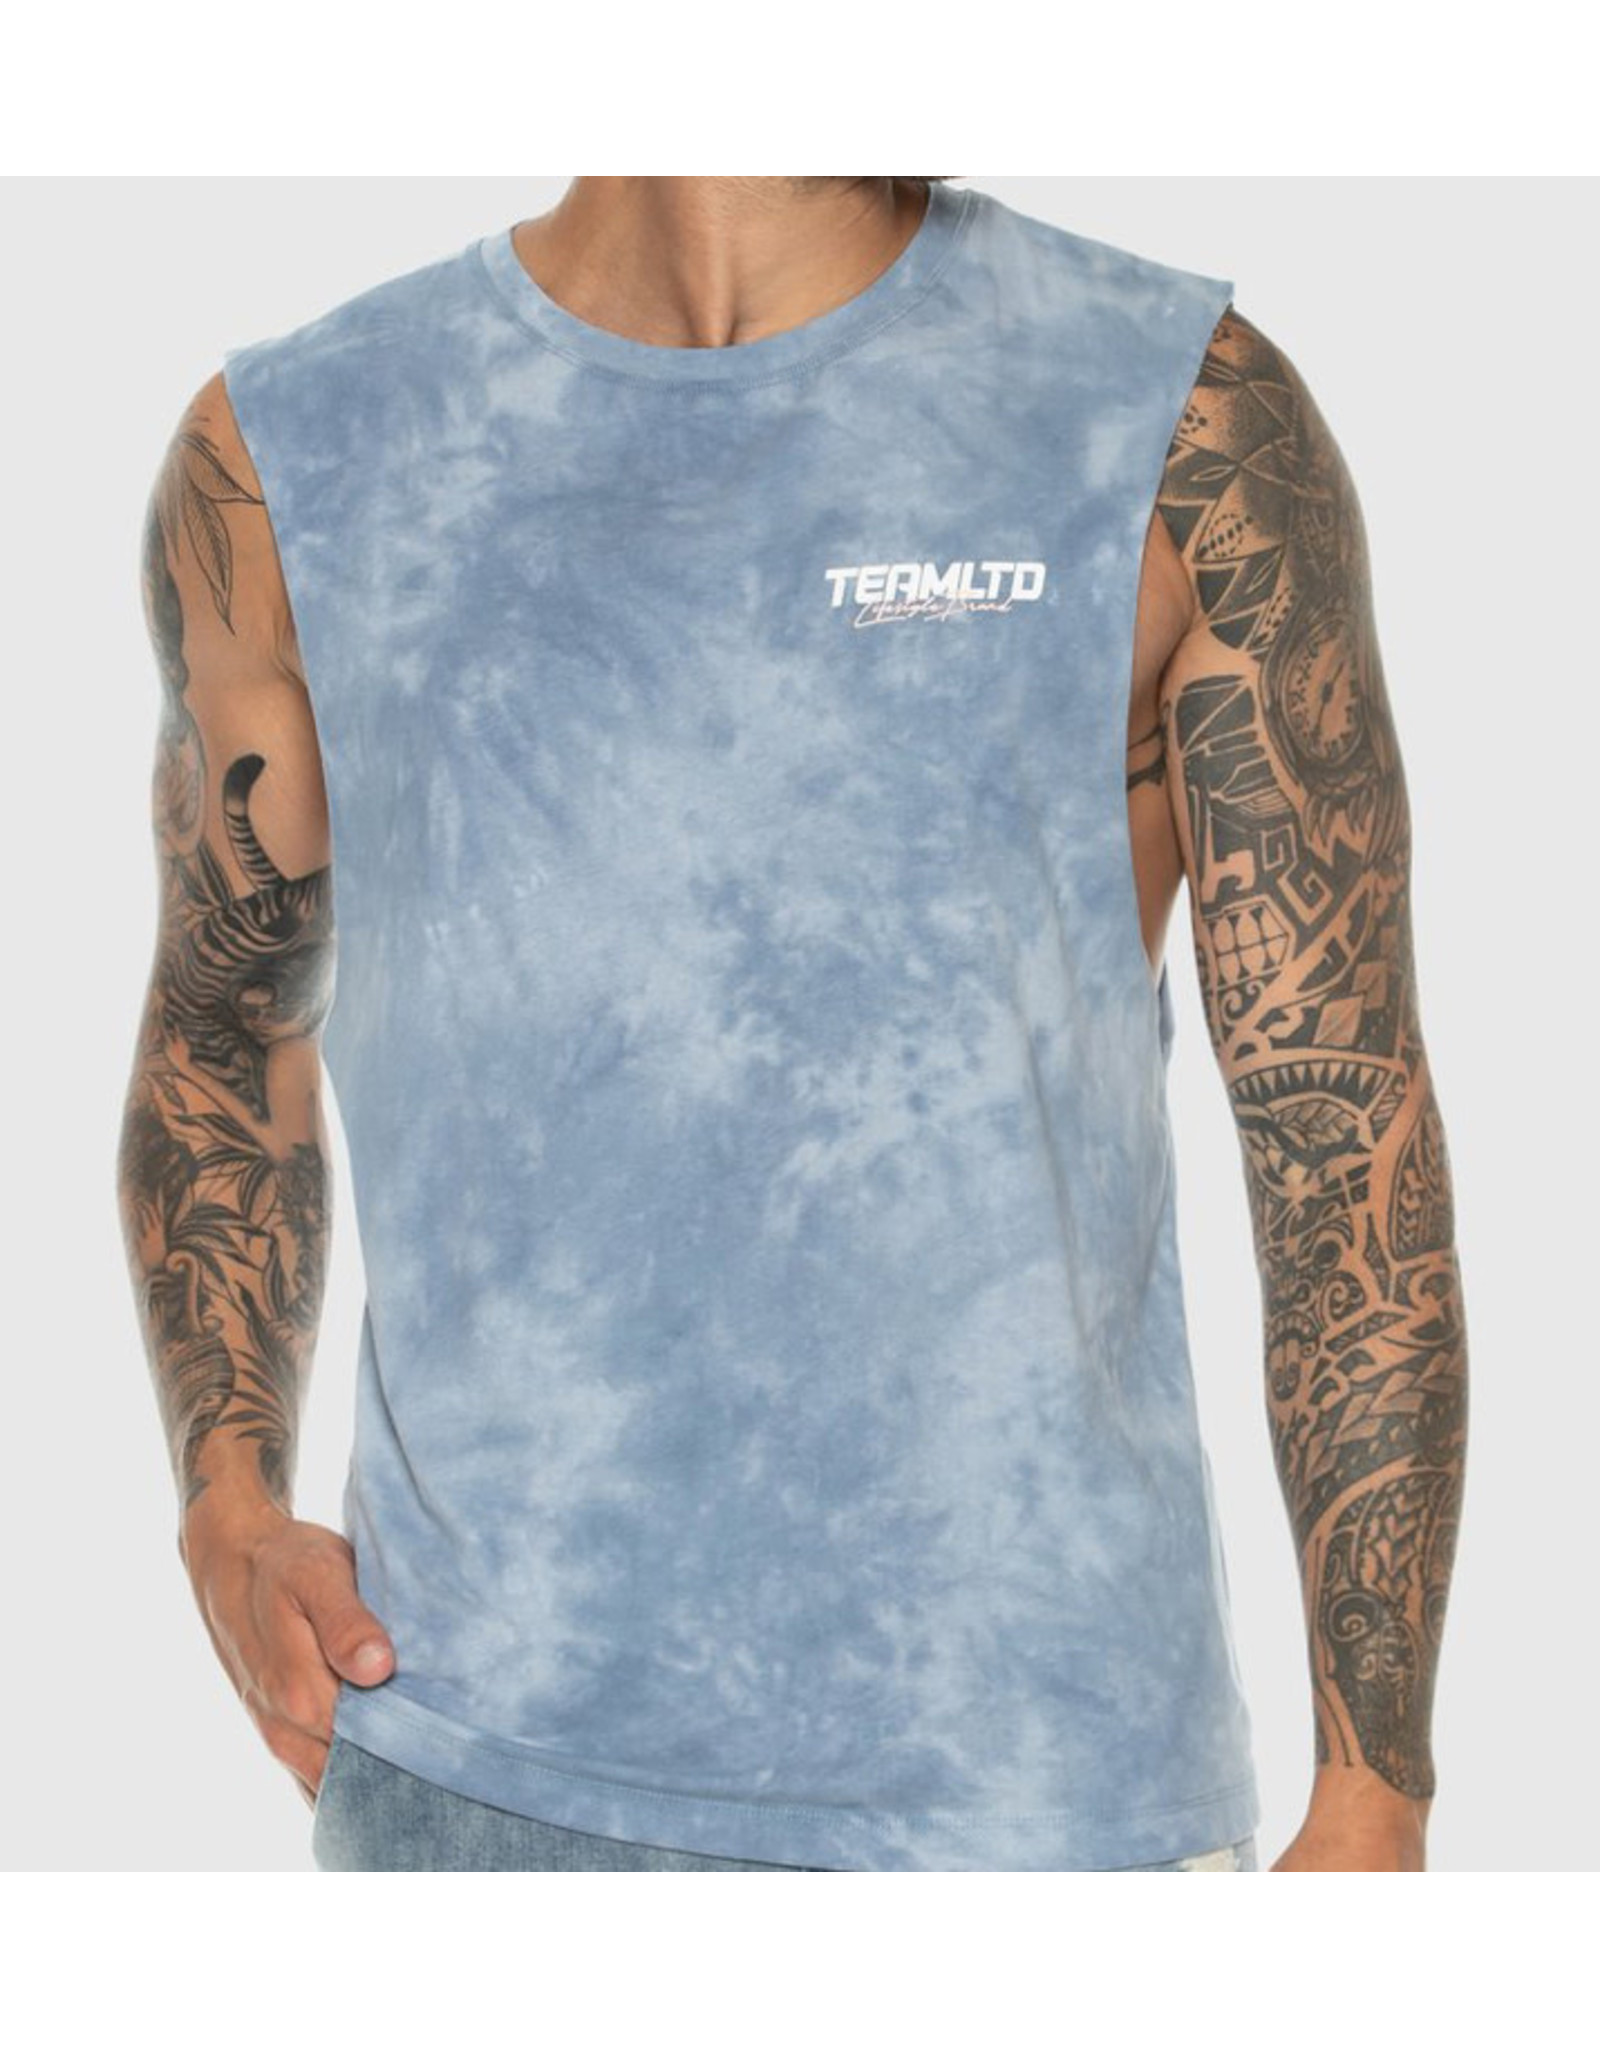 TEAMLTD Vice Tank